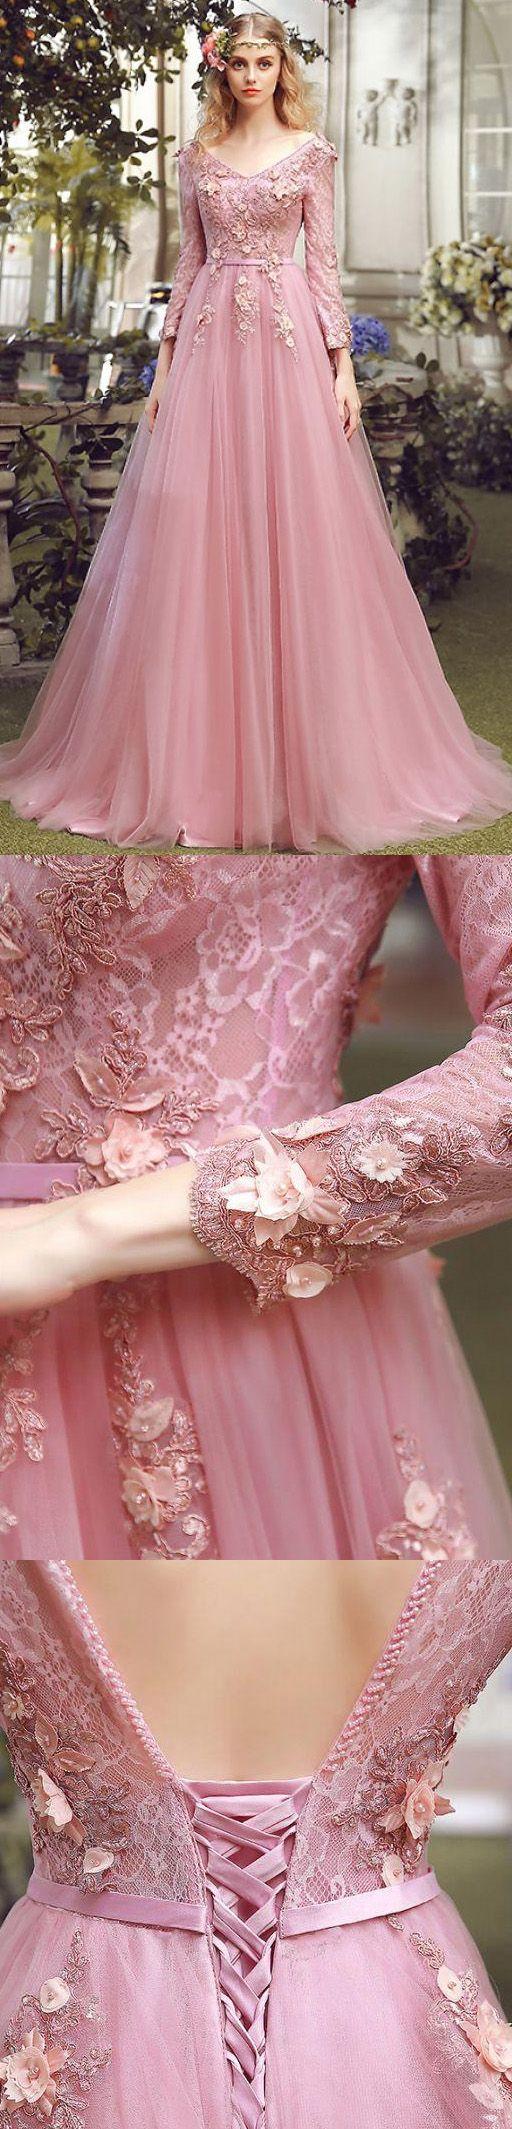 Long Sleeve Prom Dresses, Long Prom Dresses, Lace Prom Dresses, Pink ...